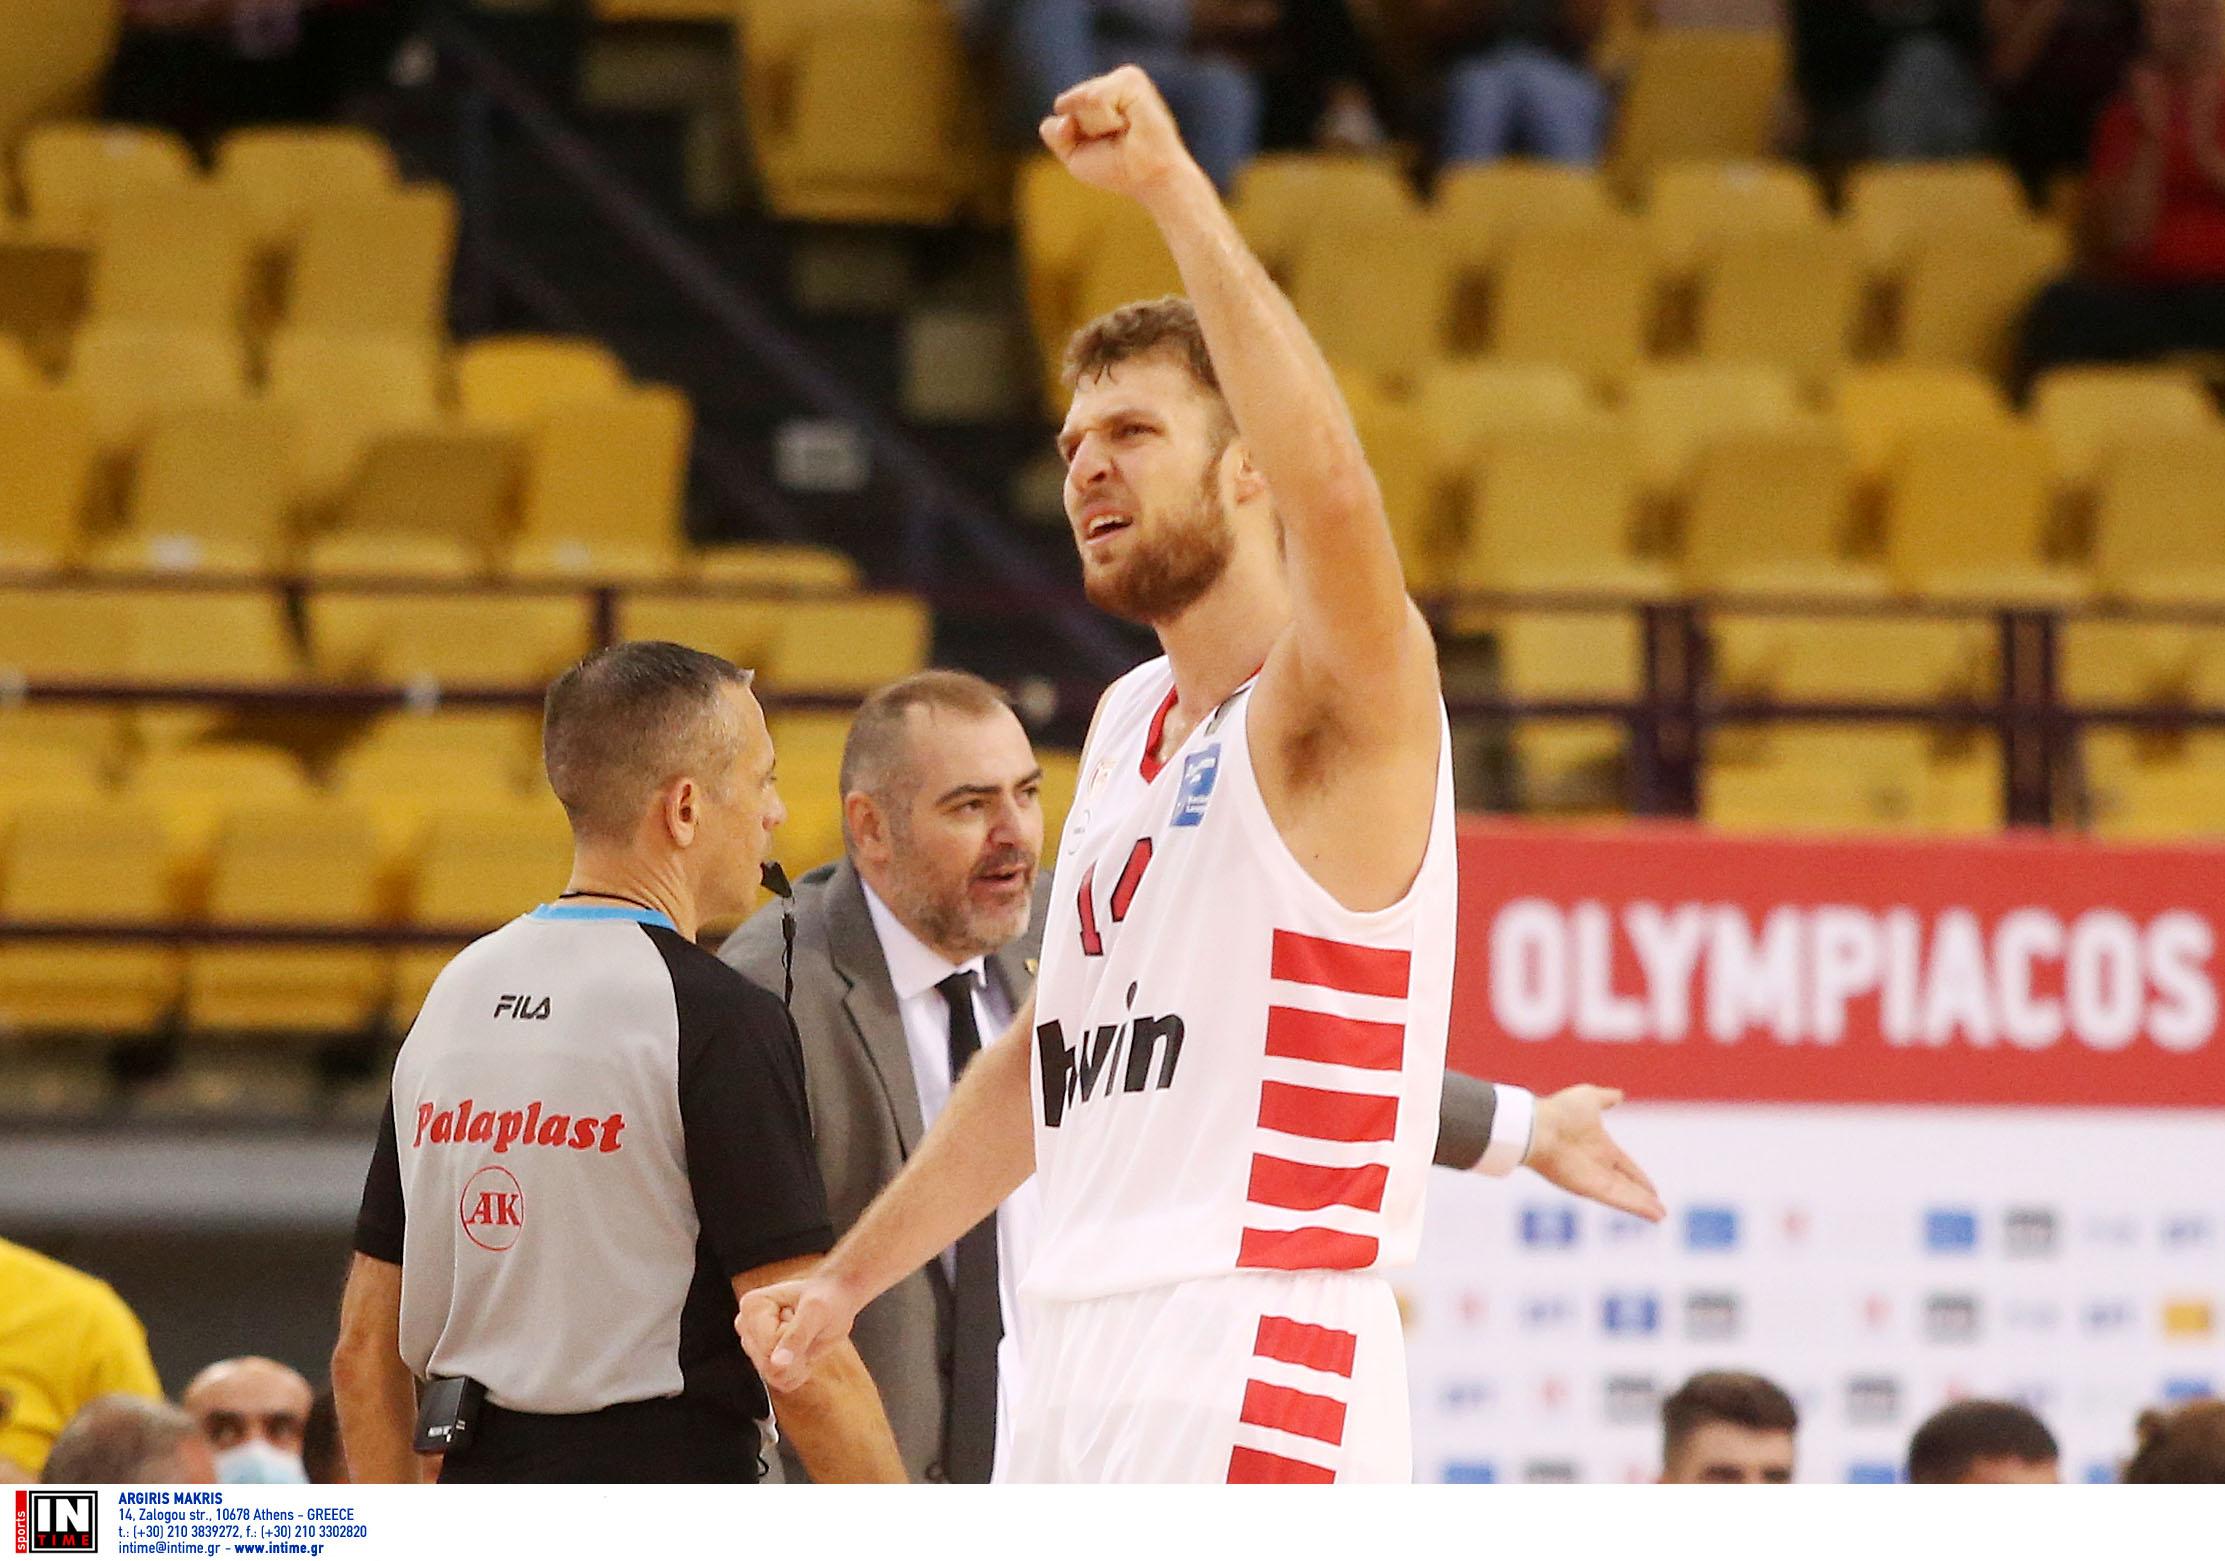 Basket League: Βεζένκοφ, Χάνλαν και Δίπλαρος μοιράστηκαν το βραβείο του MVP